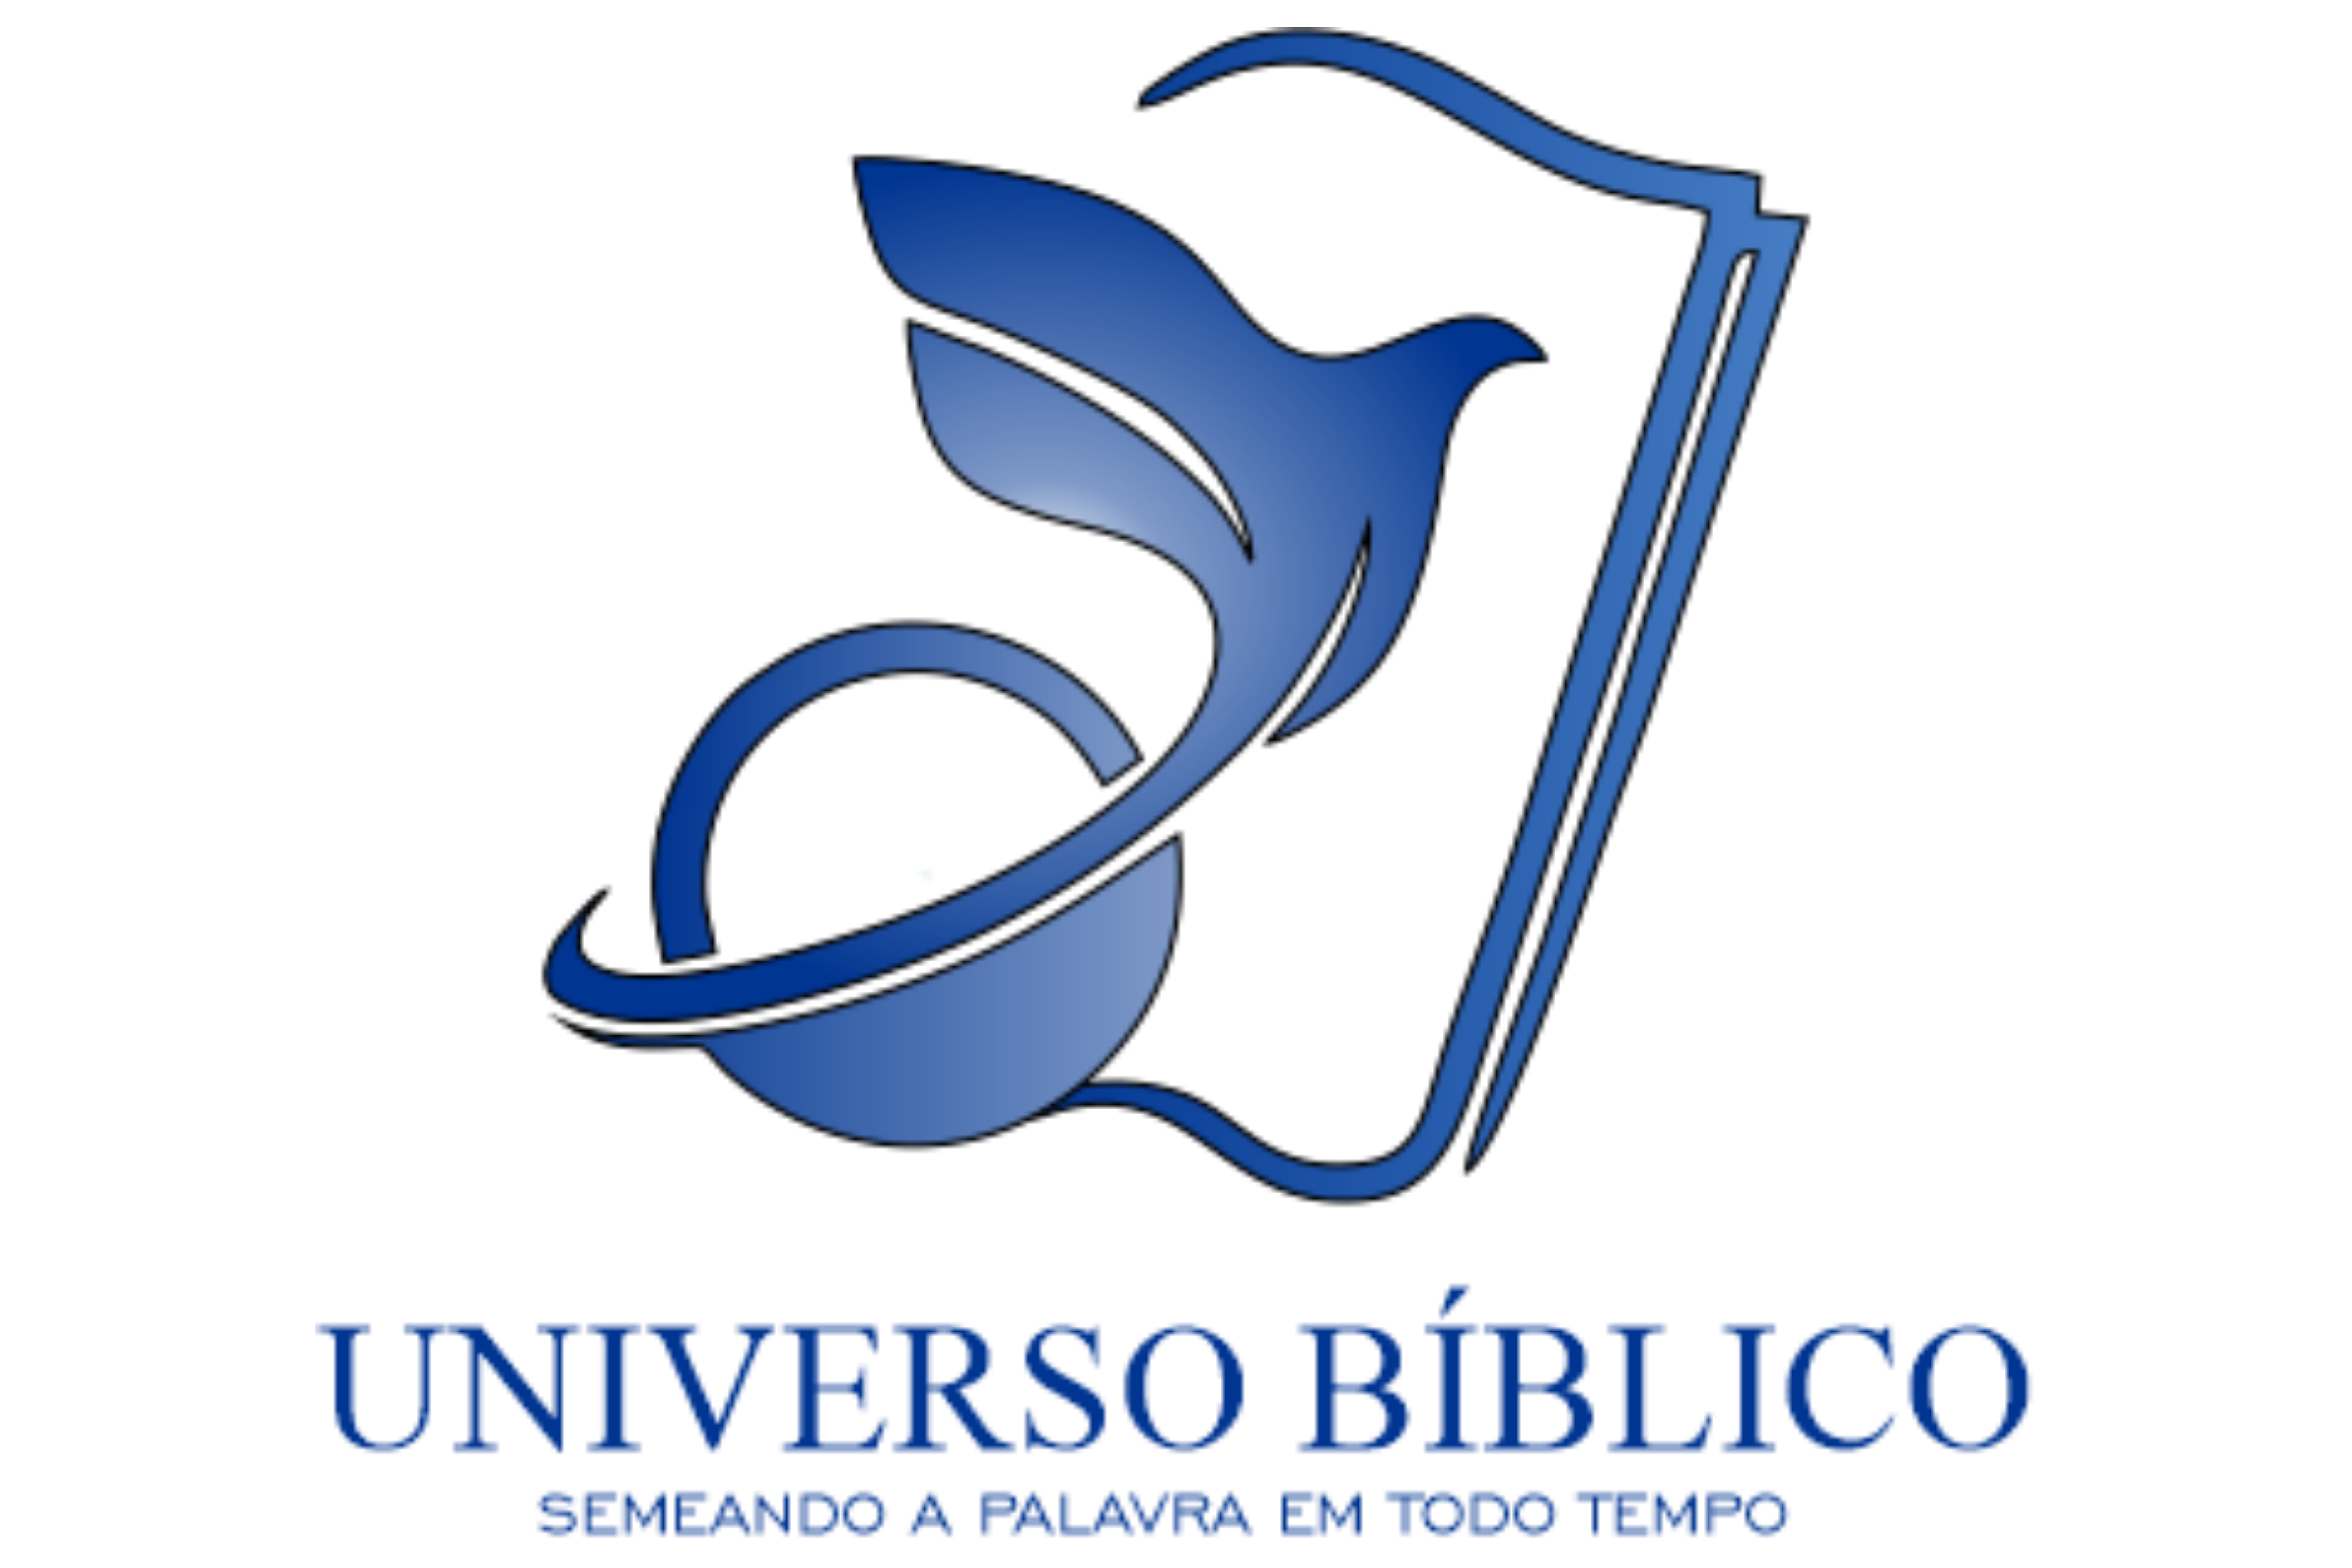 Universo Bíblico Rs